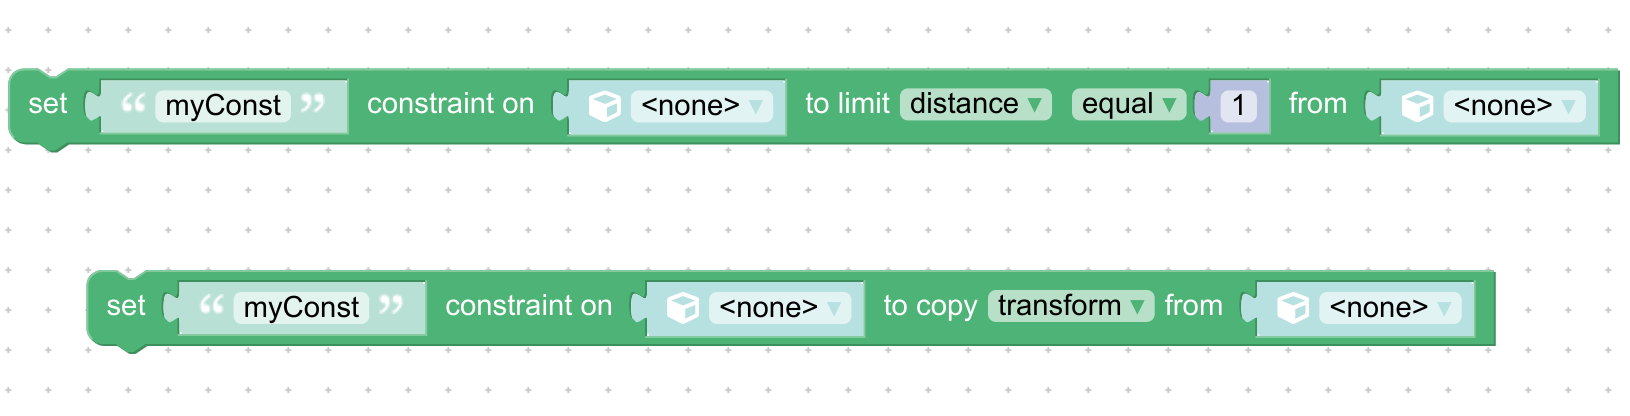 limit constraintandcopy constraintpuzzles